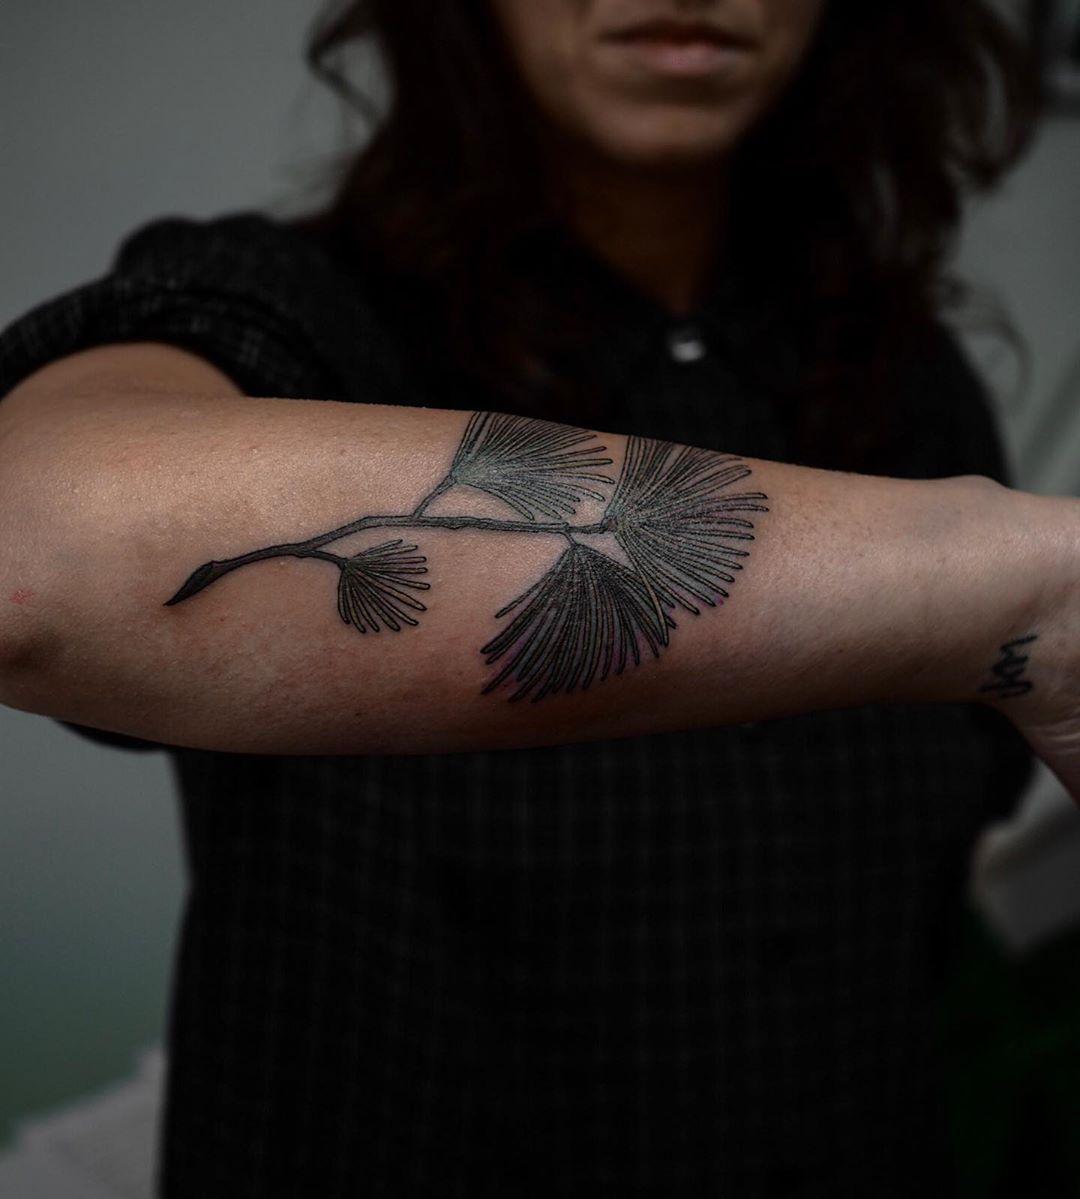 Eastern pine tattoo by @sophiabaughan